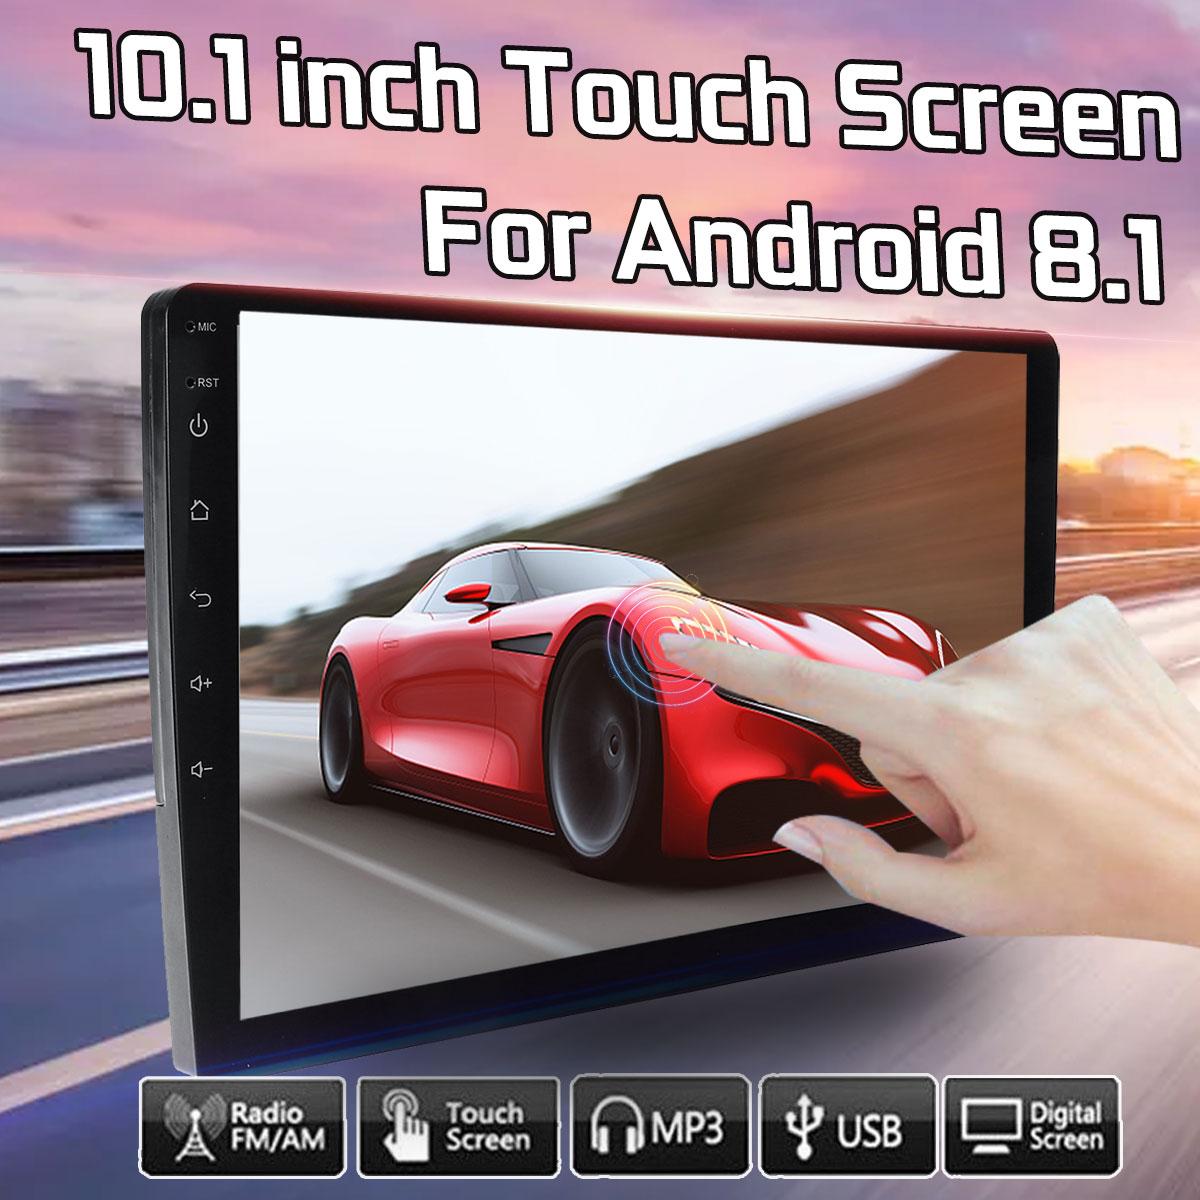 4K 10.1 Car MP5 Player Quad Core 2 DIN bluetooth FM Radio Android 8.1 WiFi GPS DVBT DAB Car Stereo Car Multimedia Player 1+16G4K 10.1 Car MP5 Player Quad Core 2 DIN bluetooth FM Radio Android 8.1 WiFi GPS DVBT DAB Car Stereo Car Multimedia Player 1+16G